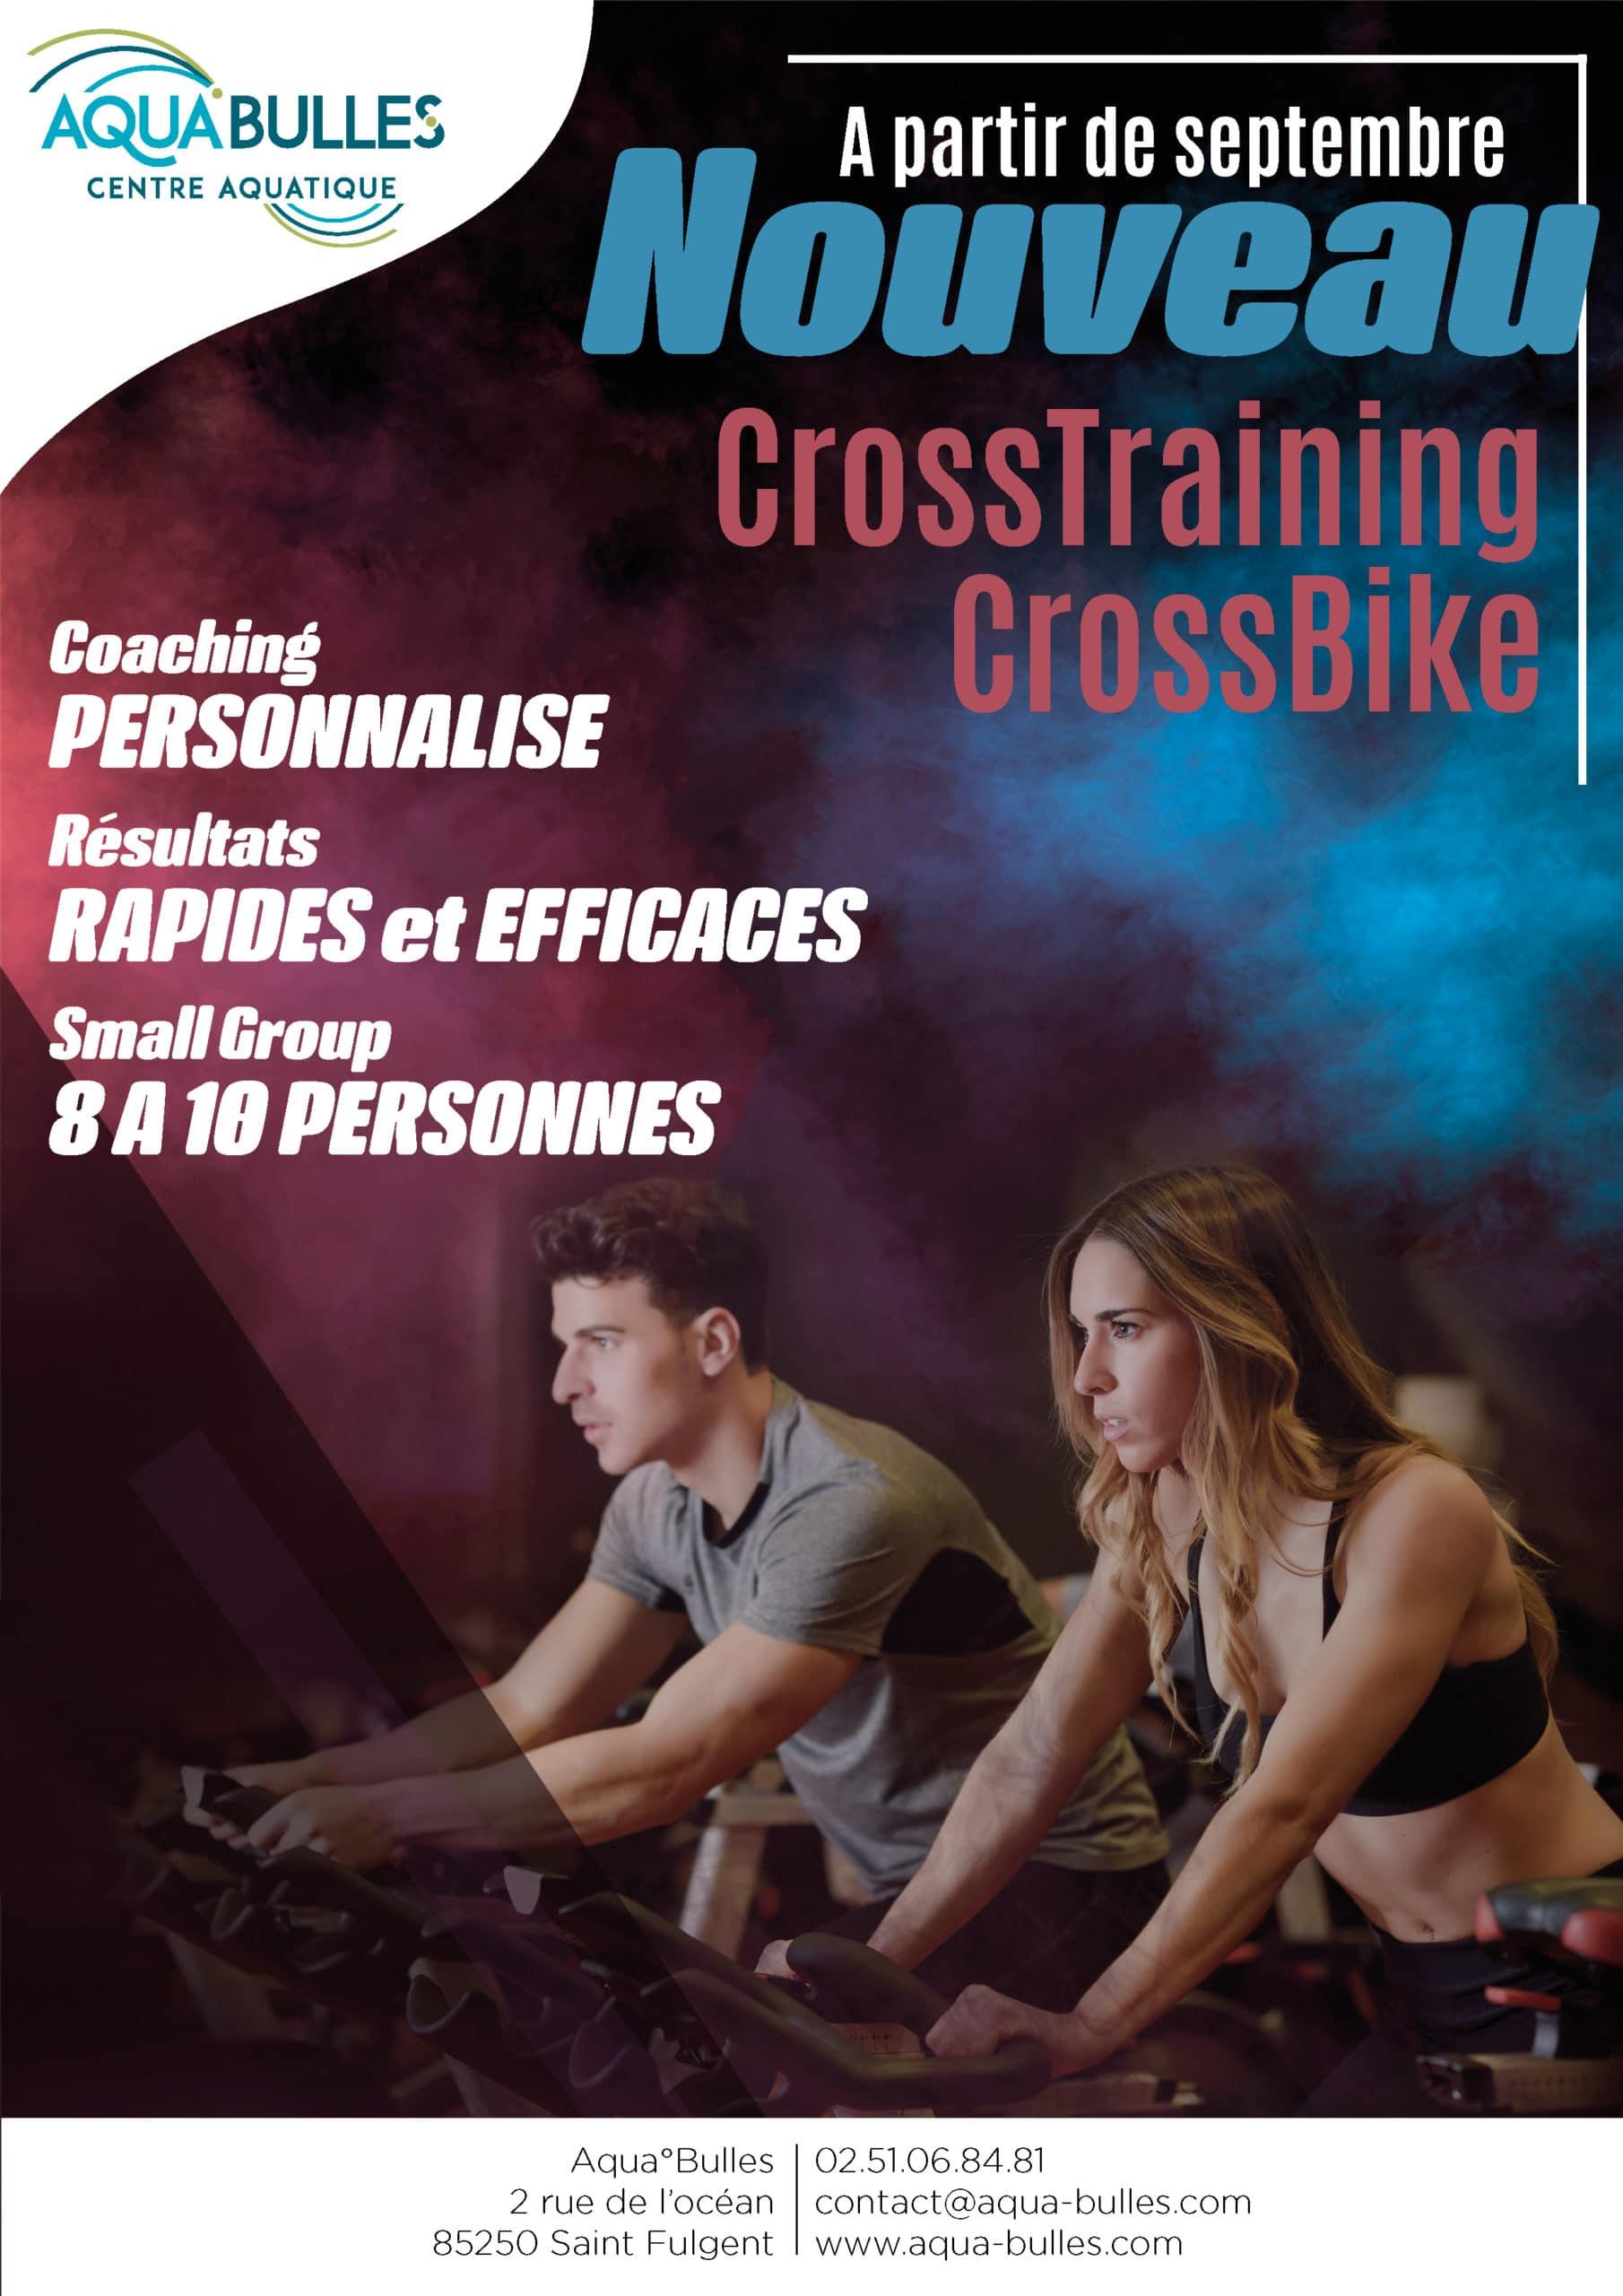 Activité fitness en salle - Crosstraing - Crossbike - Aqua°Bulles